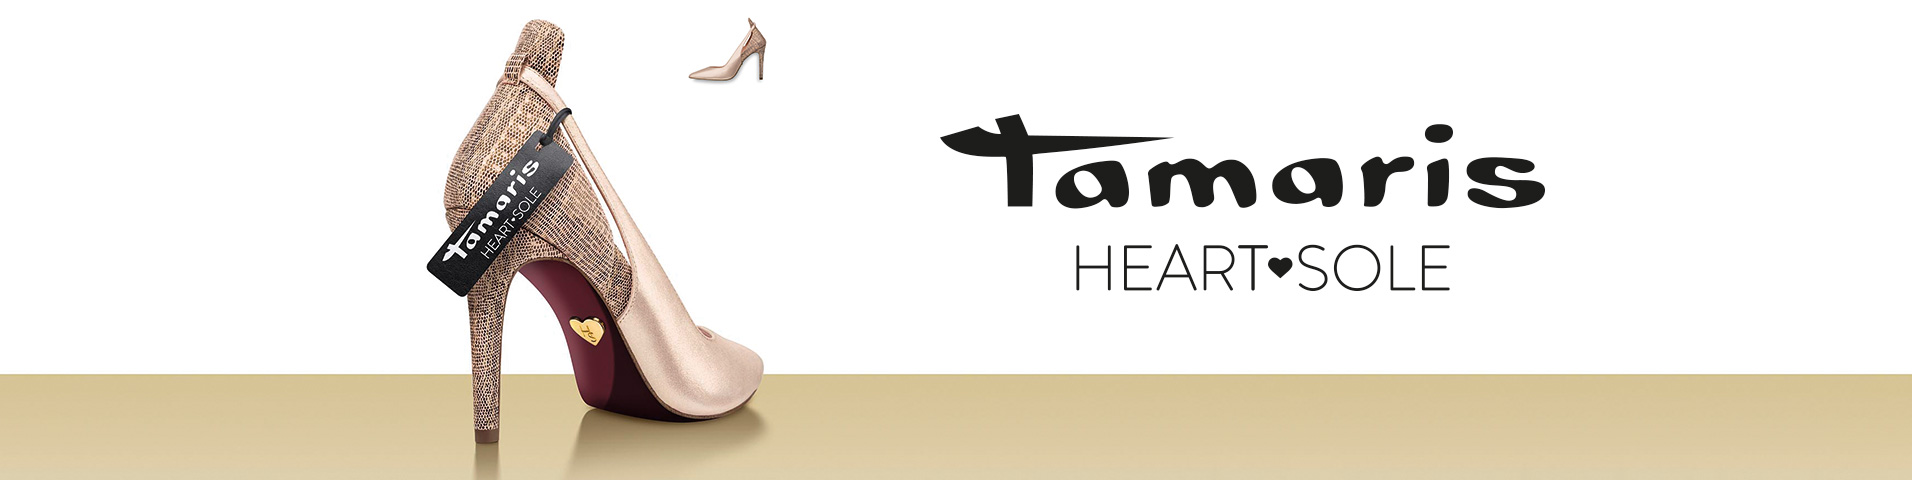 Tamaris Heart & Sole Online Shop | Tamaris Heart & Sole